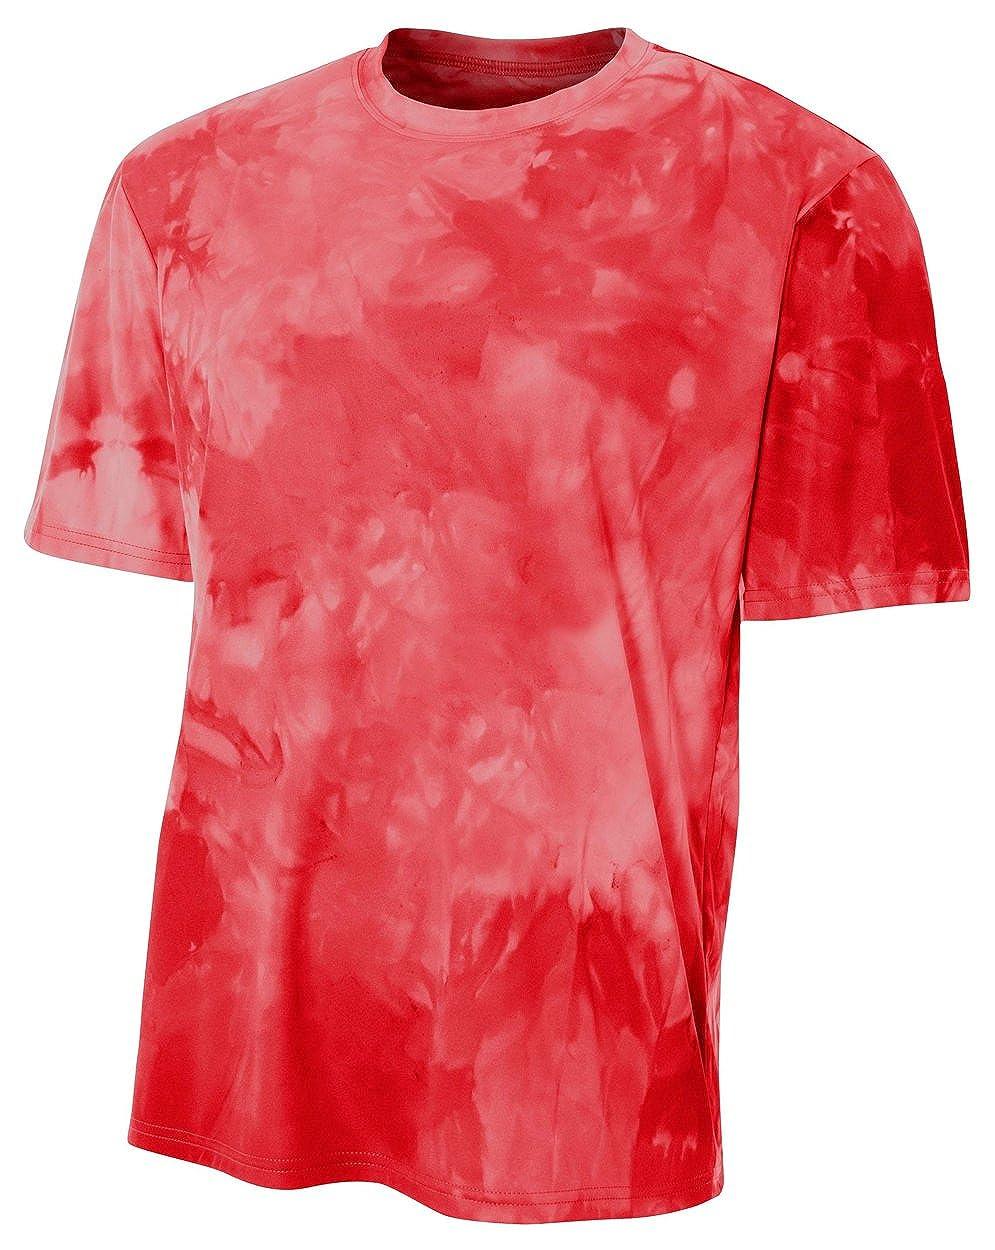 Medium Scarlet A4 Mens Cloud Dye Tech Tee